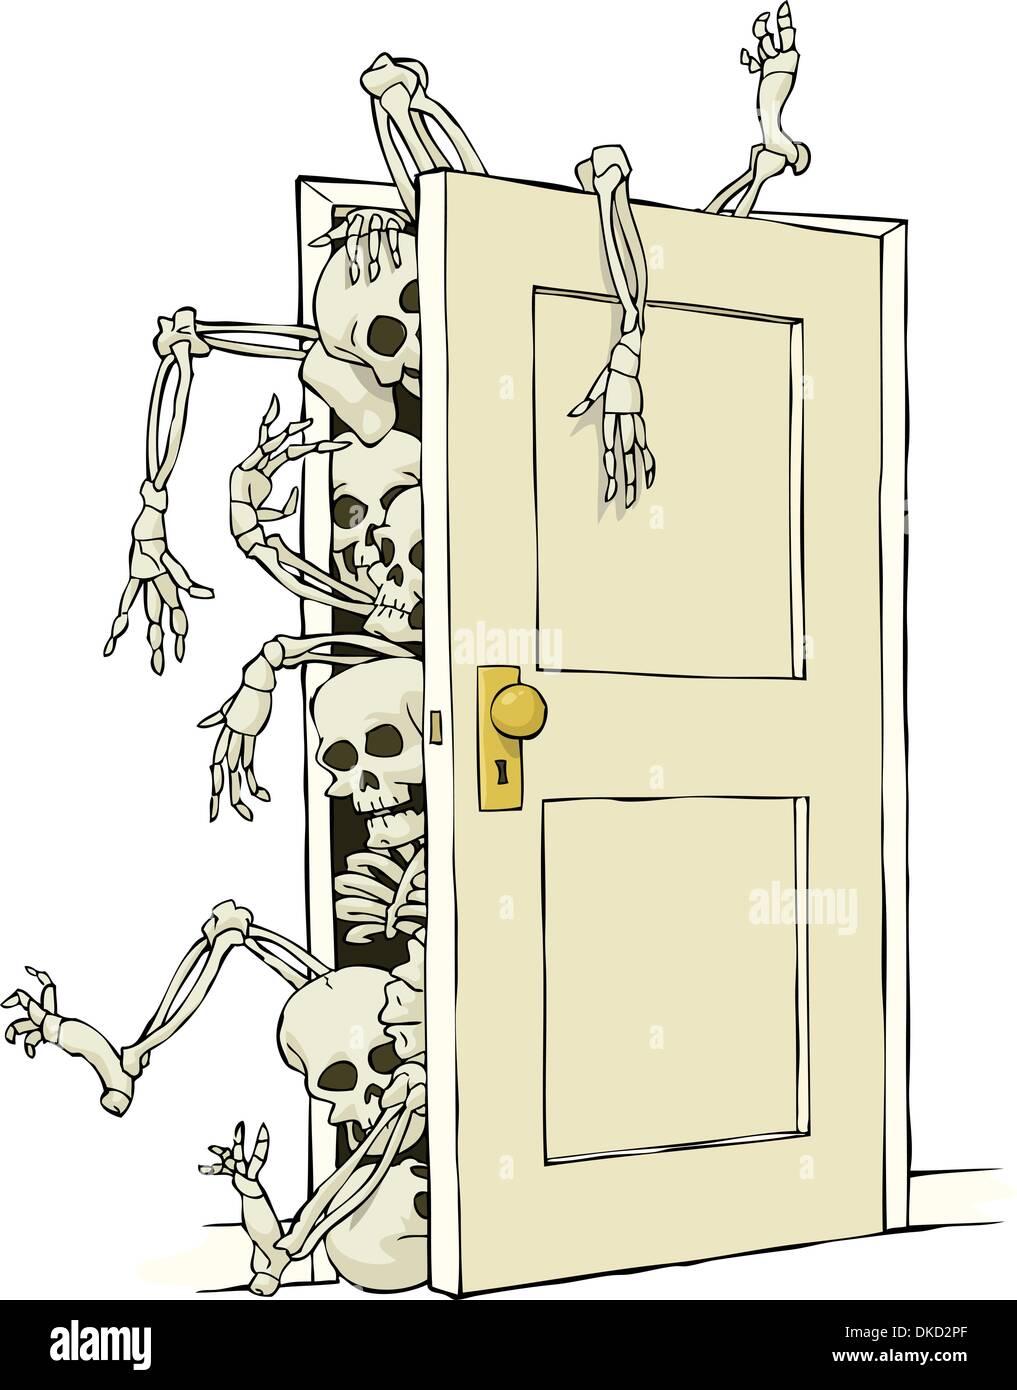 Cartoon Skeletons In The Closet Vector Illustration Stock